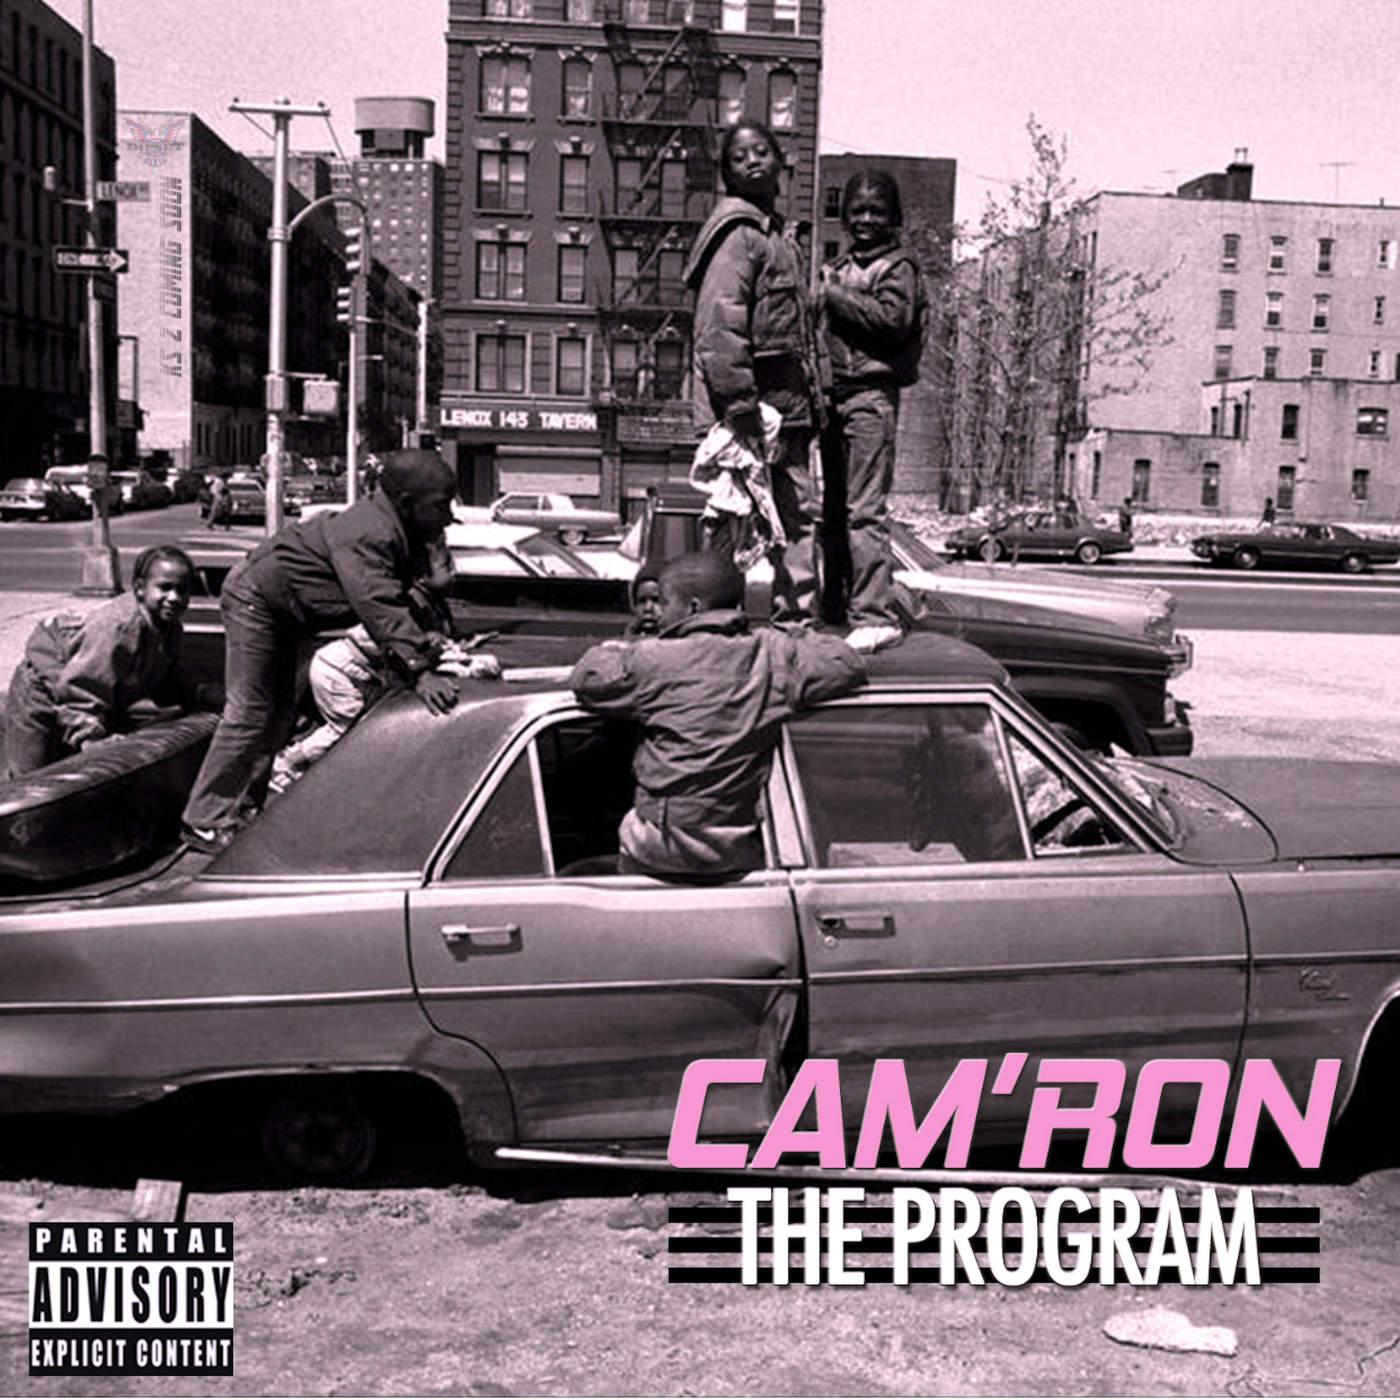 The Program - Cam'ron